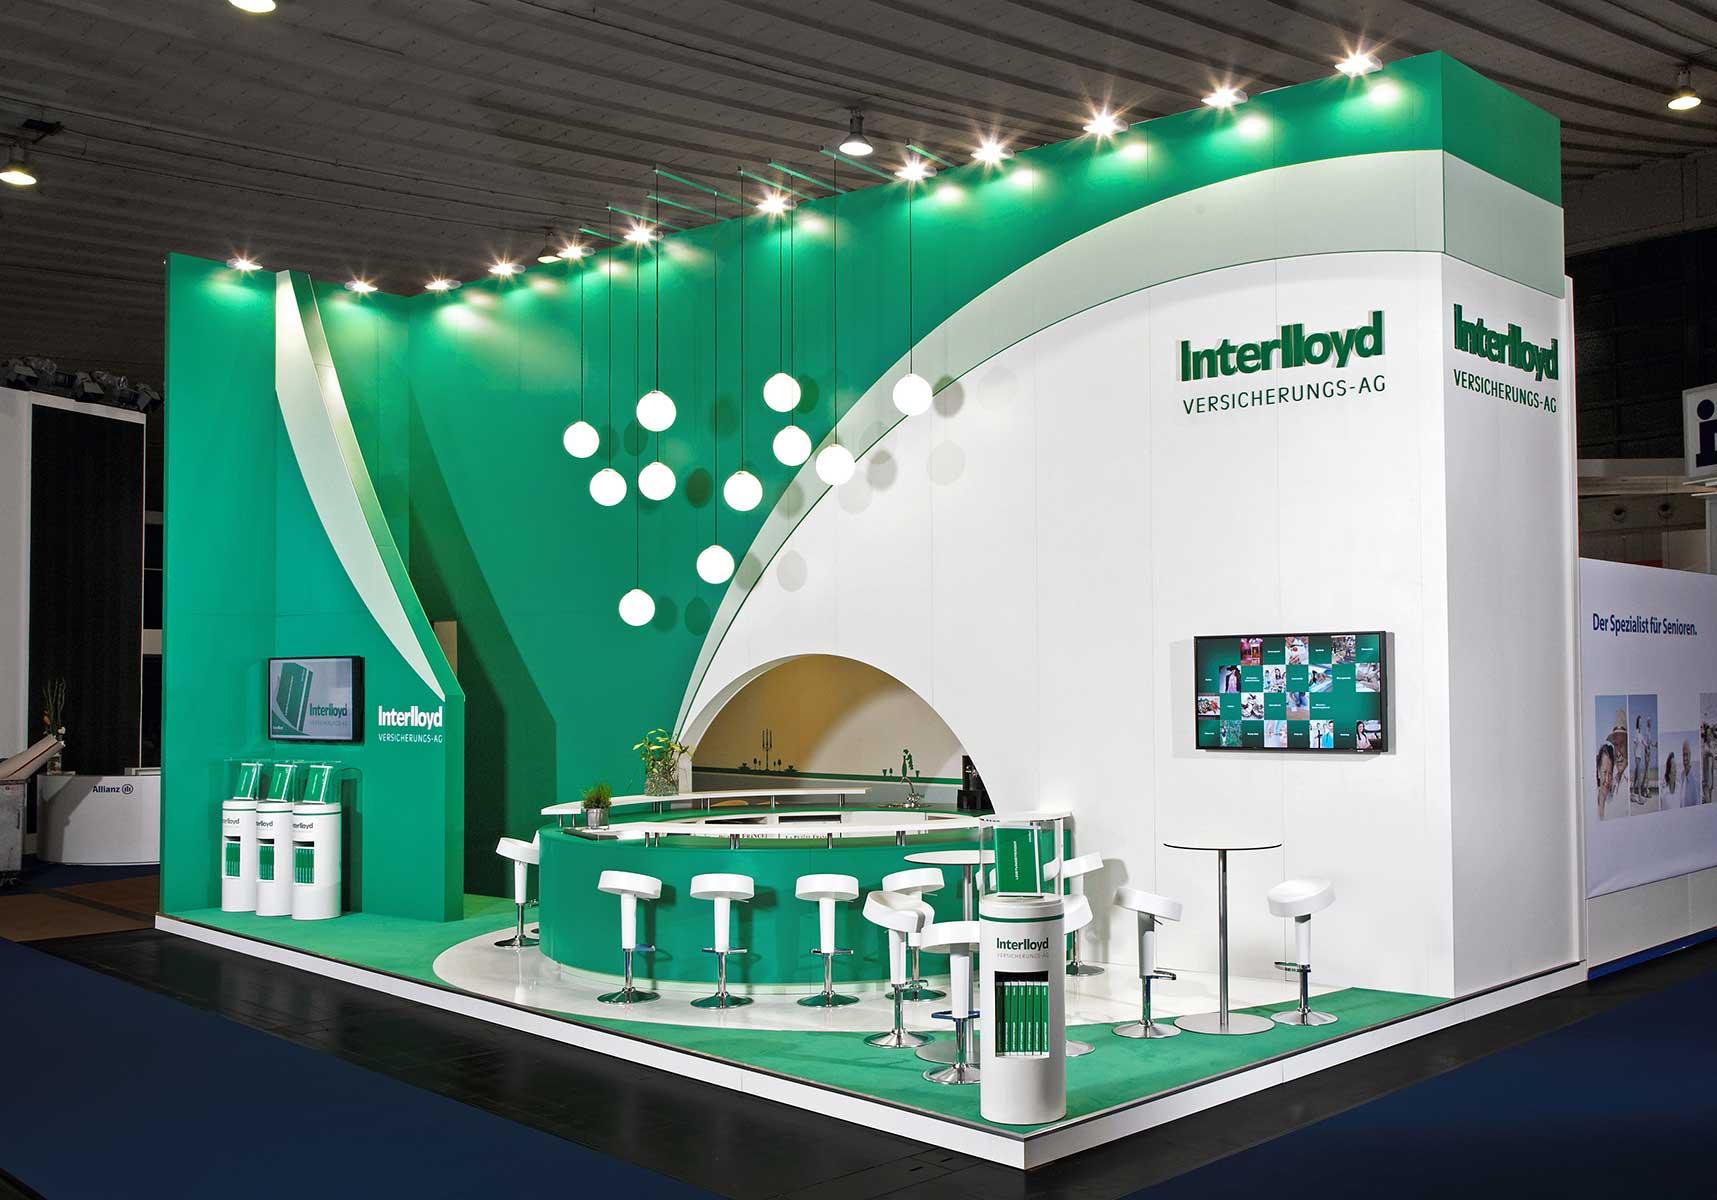 Exhibition Stand Insurance : Interlloyd blickfang messebau gmbh